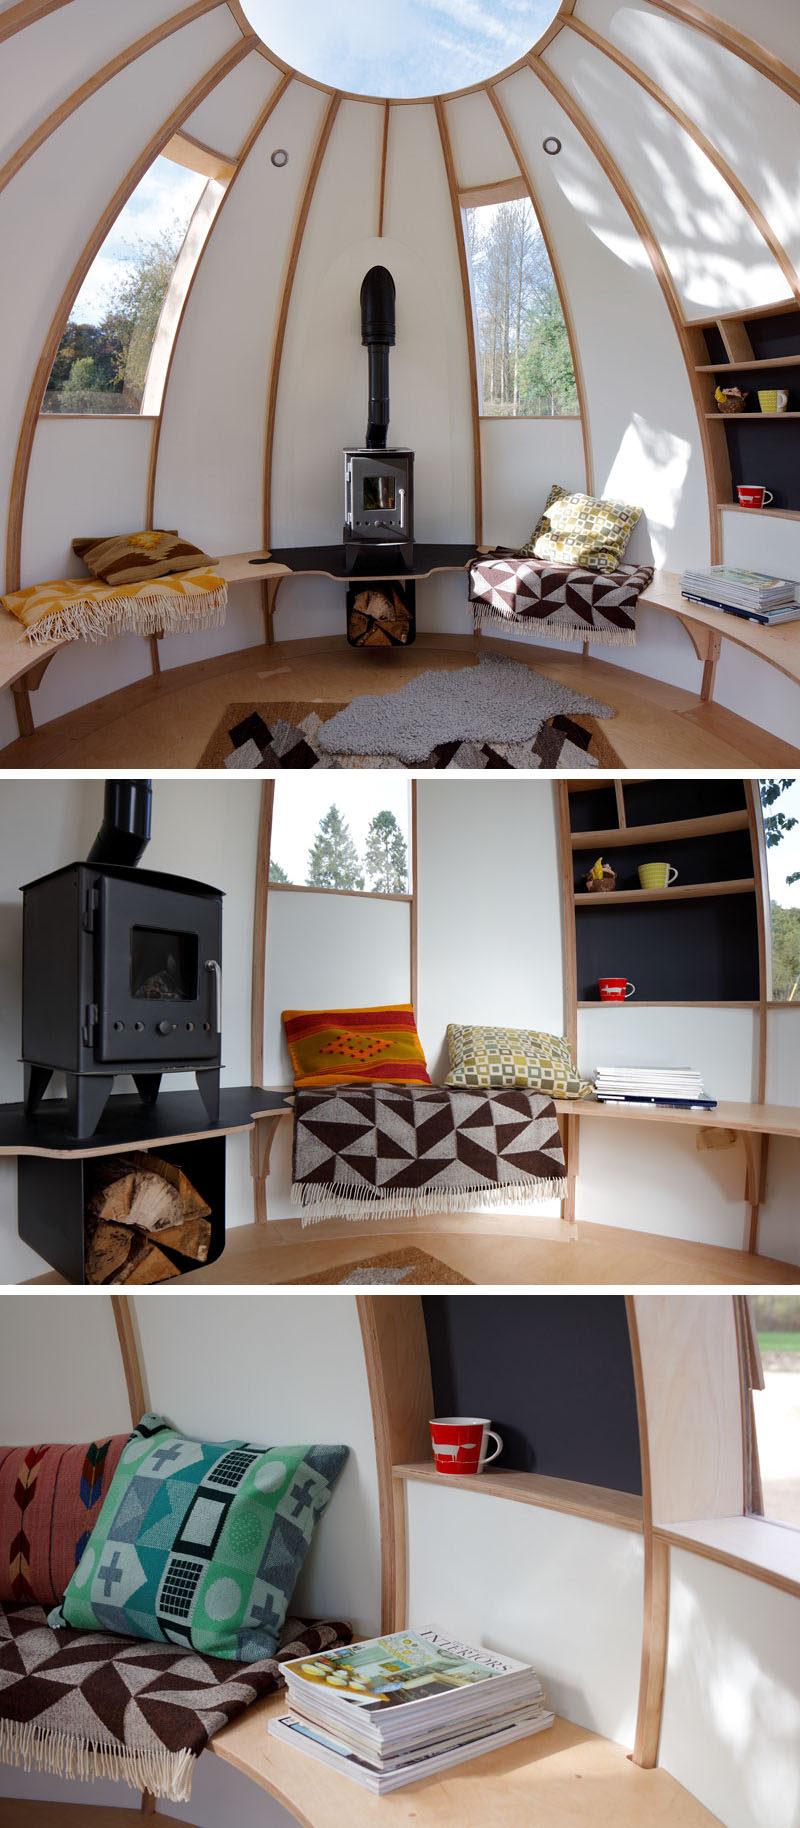 This modern outdoor pod (or garden studio) has a small fireplace to keep warm and windows to enjoy the view. #GardenStudio #BackyardStudio